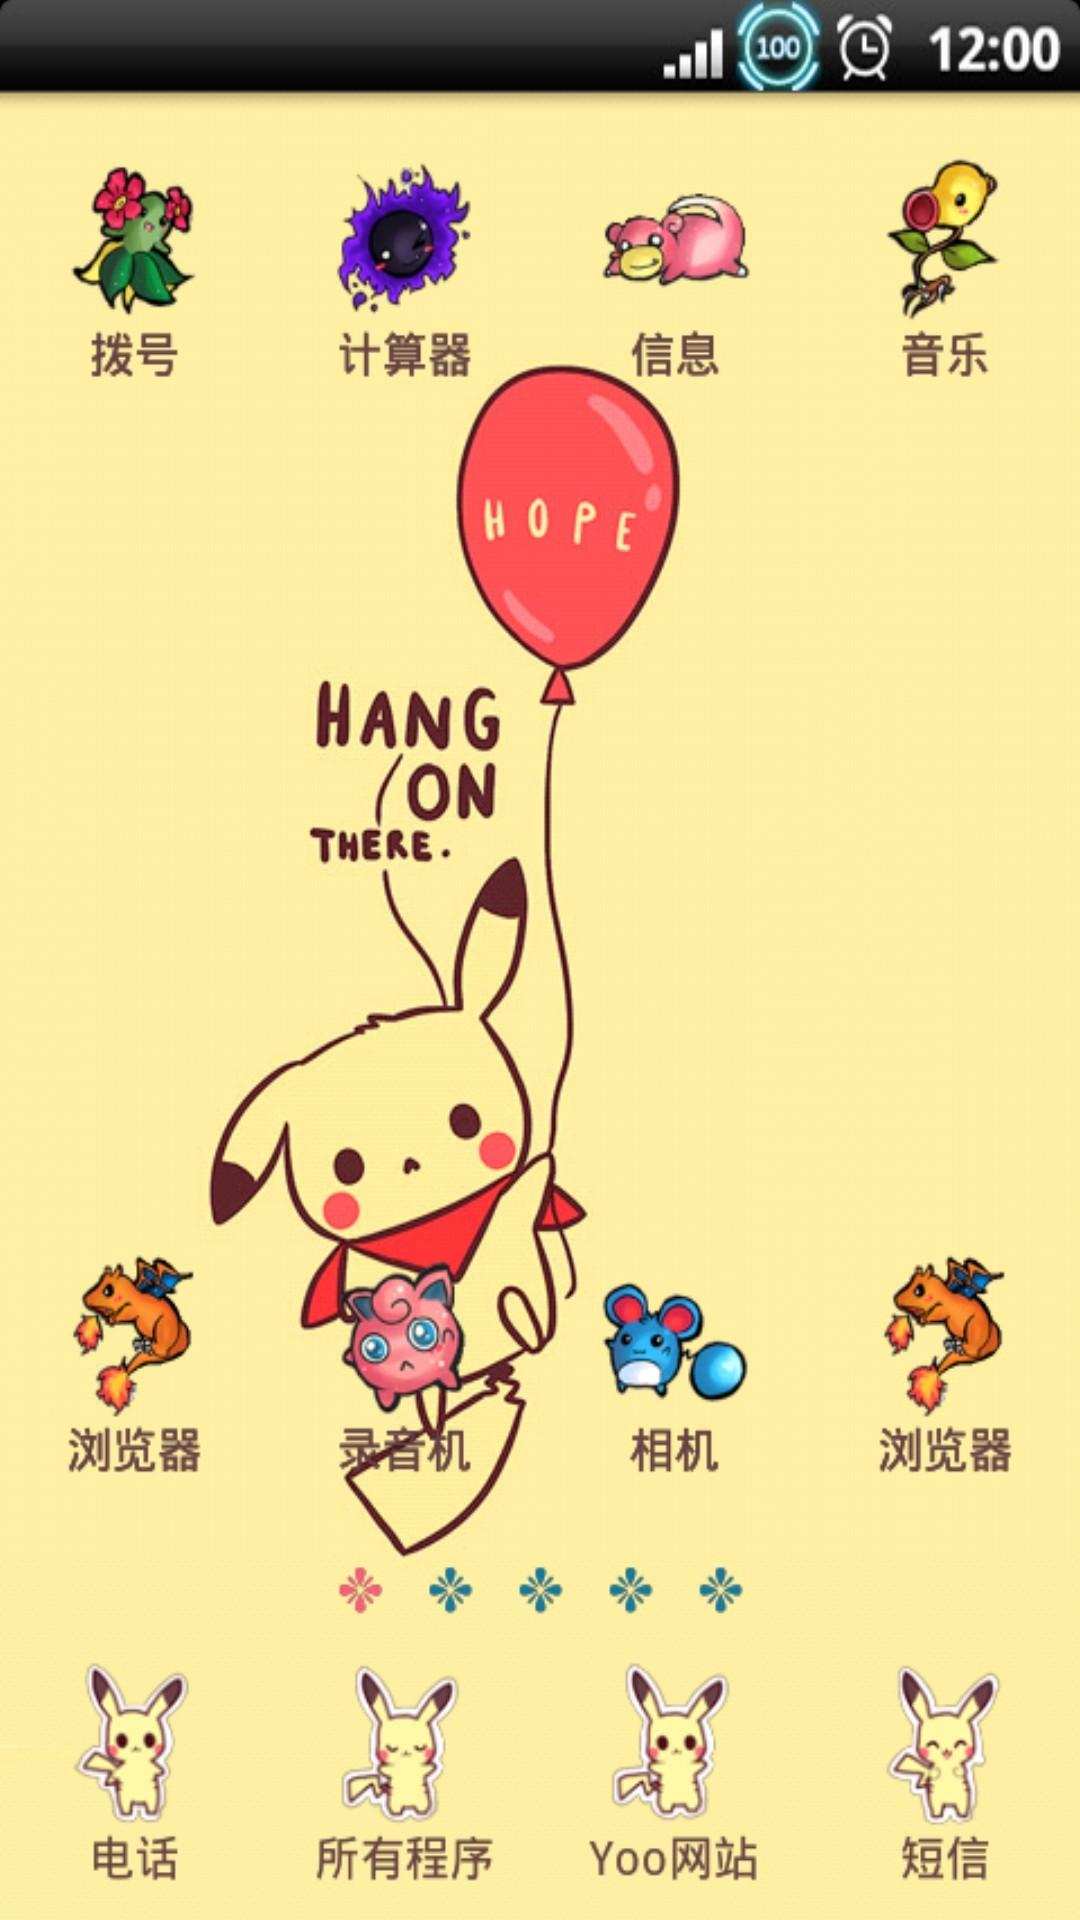 yoo主题-萌神皮卡丘下载_yoo主题-萌神皮卡丘手机版